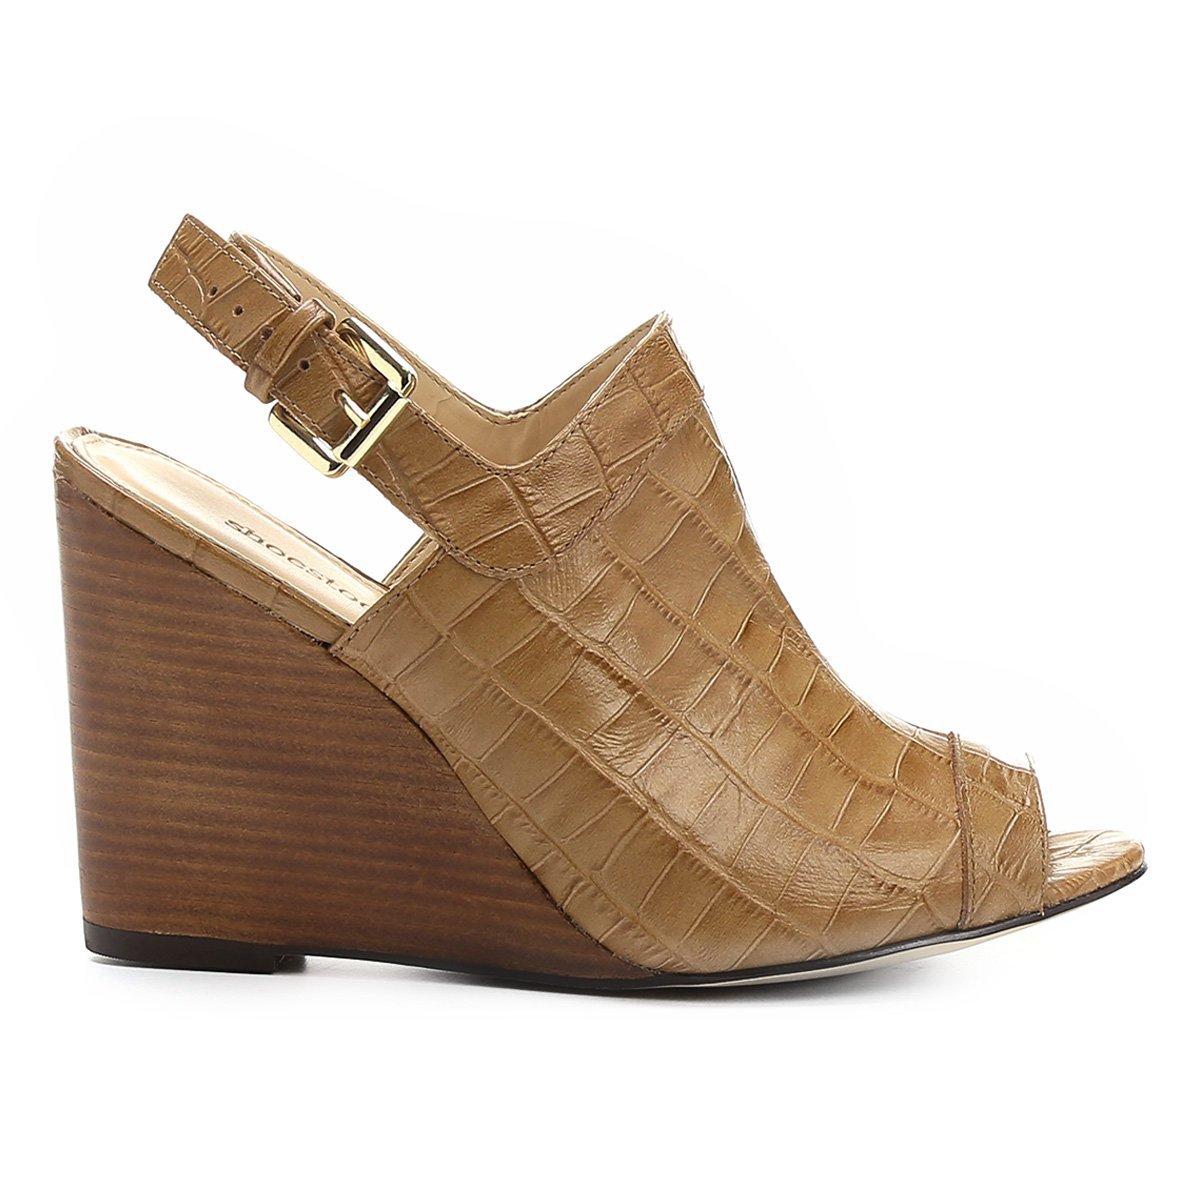 5f7b95d6f1 Sandália Anabela Couro Shoestock Abotinada Feminina